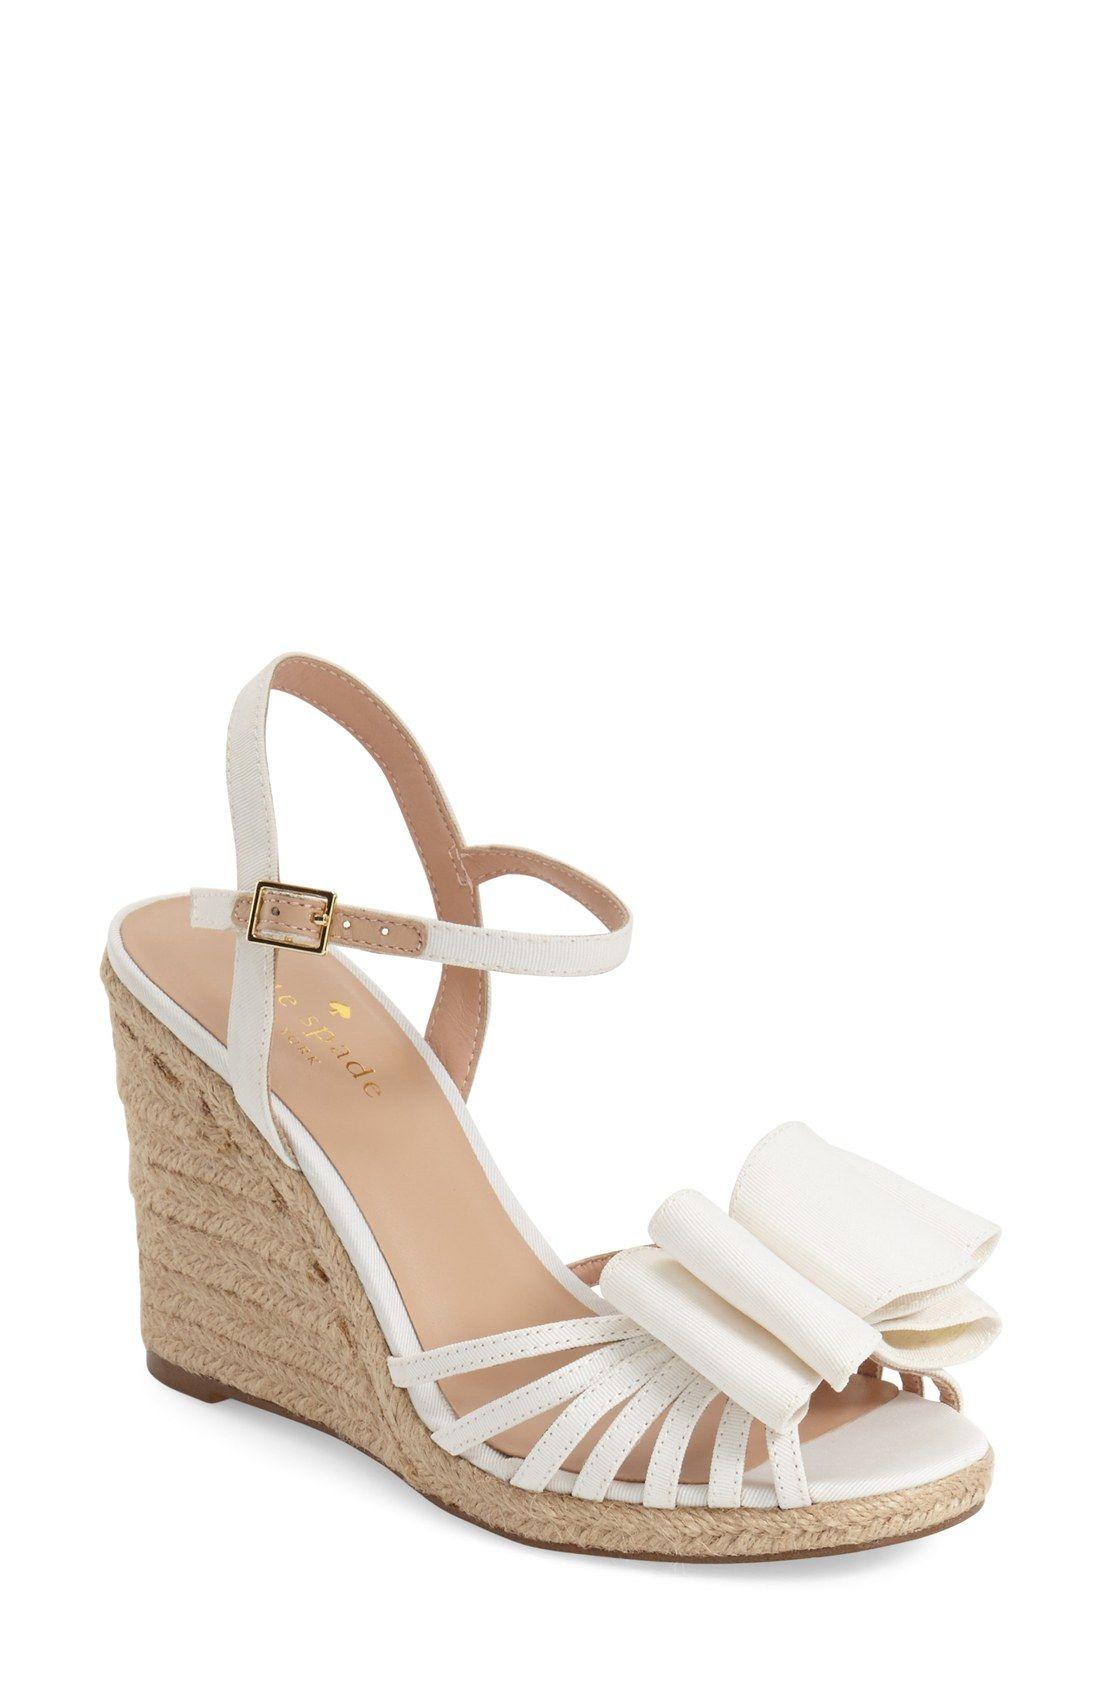 d42753dd4b0b kate spade new york  biana  grosgrain bow wedge sandal (Women ...